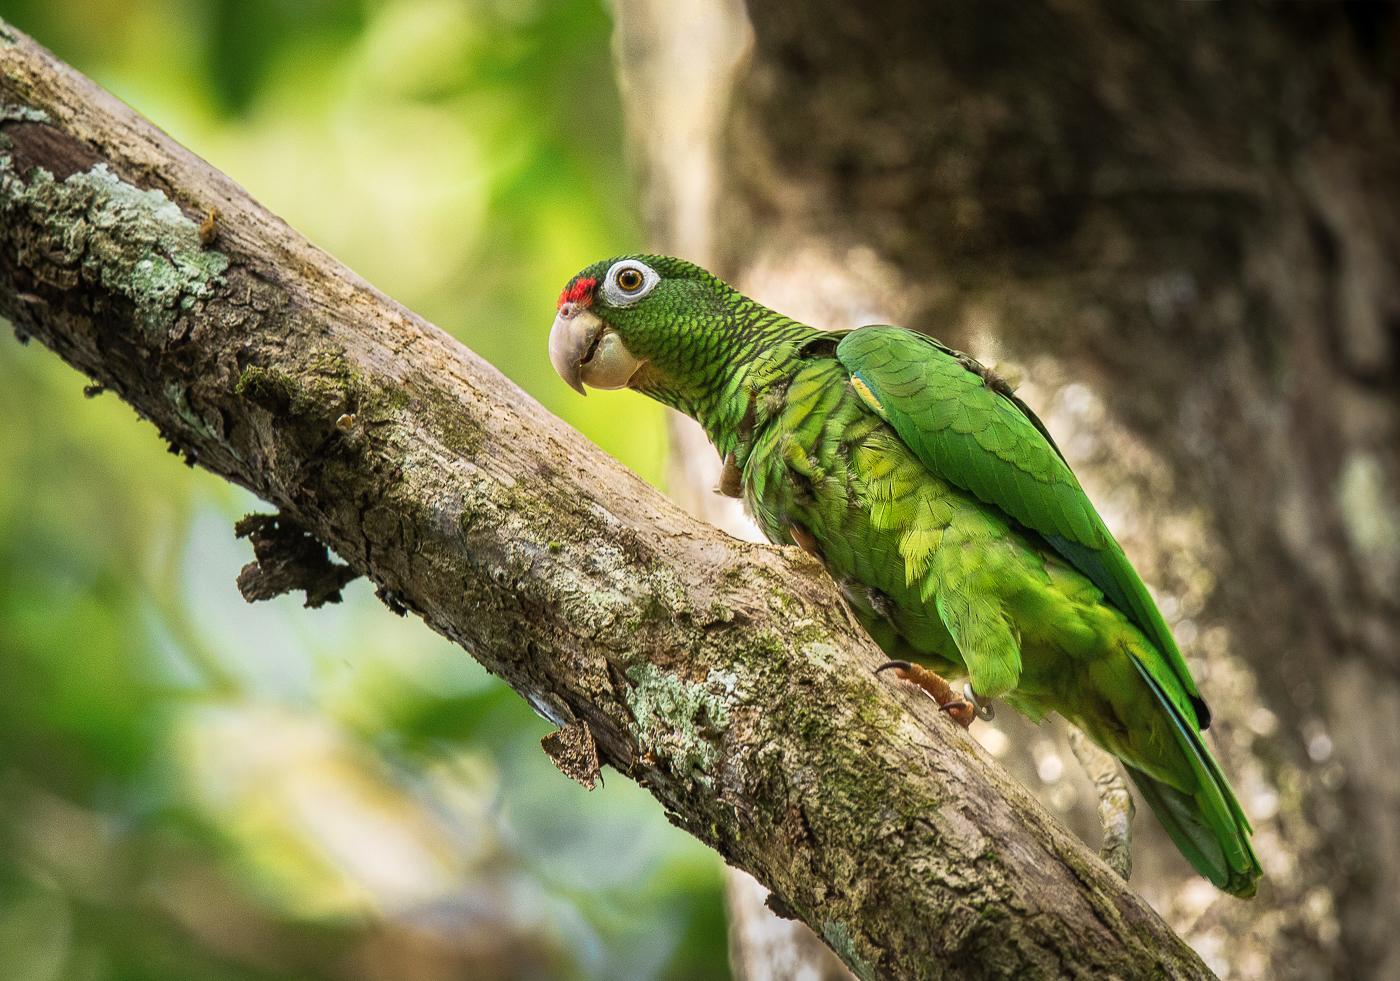 Somos De Aqui The Enduring Wildlife Of Puerto Rico